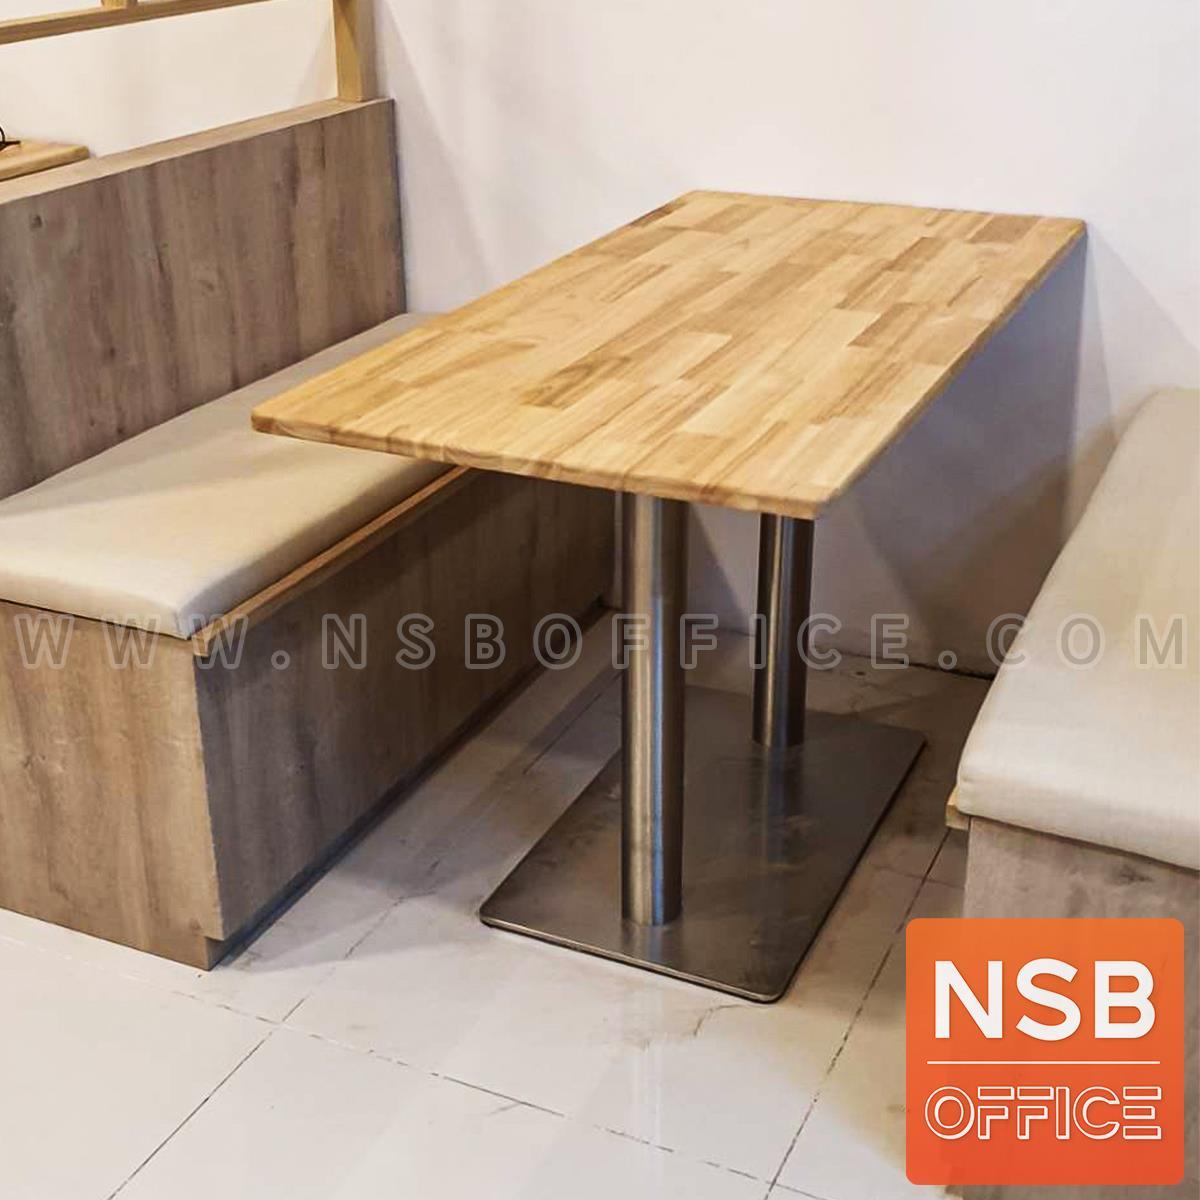 A14A280:โต๊ะบาร์ COFFEE รุ่น Tessella (เทสเซลล่า)  หน้าท็อปไม้ยางพารา ขาสเตนเลสเหลี่ยมแบน